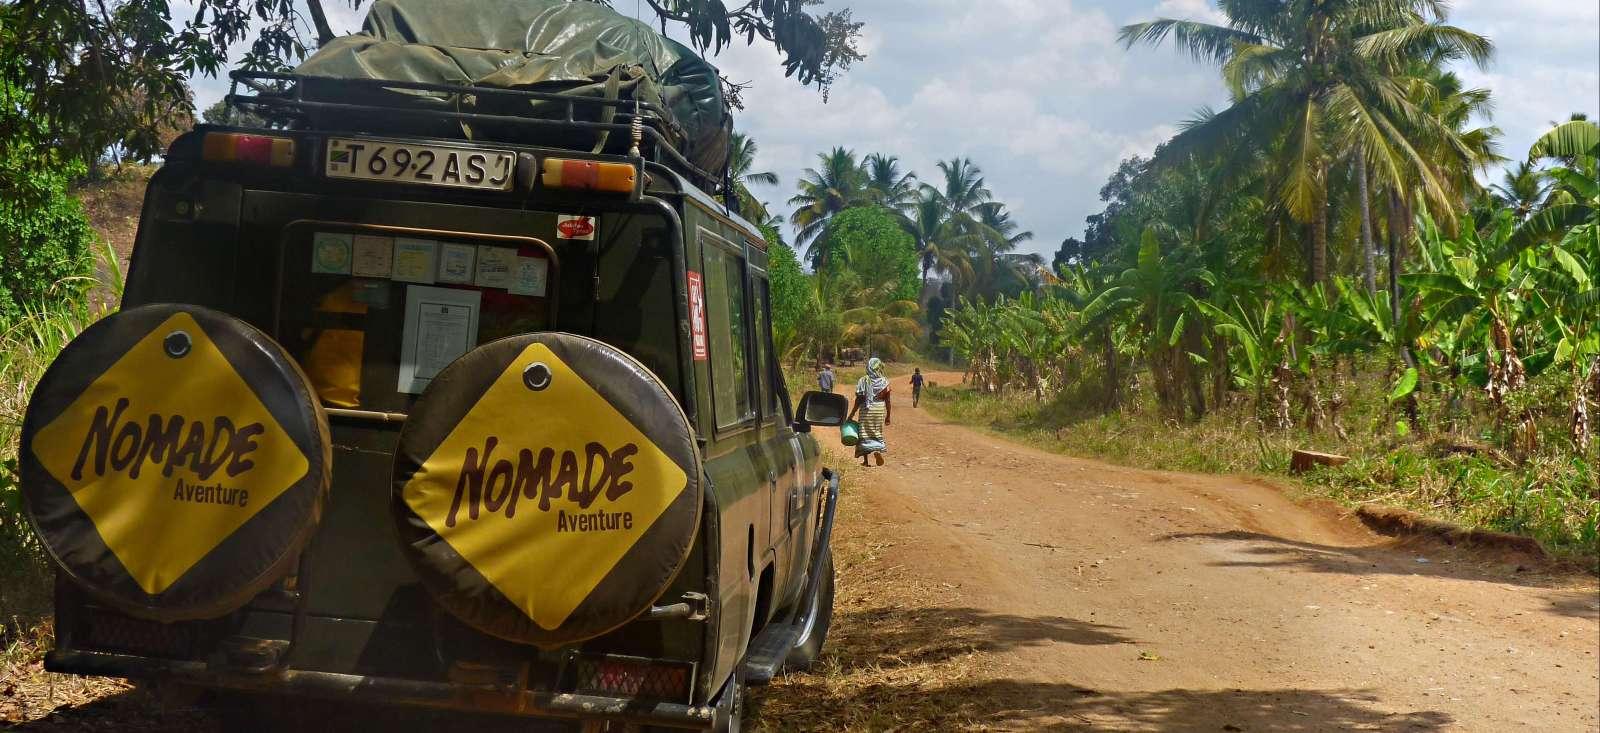 Voyage avec des animaux Tanzanie : Trek sur le Kilimandjaro, Safari & Zanzibar